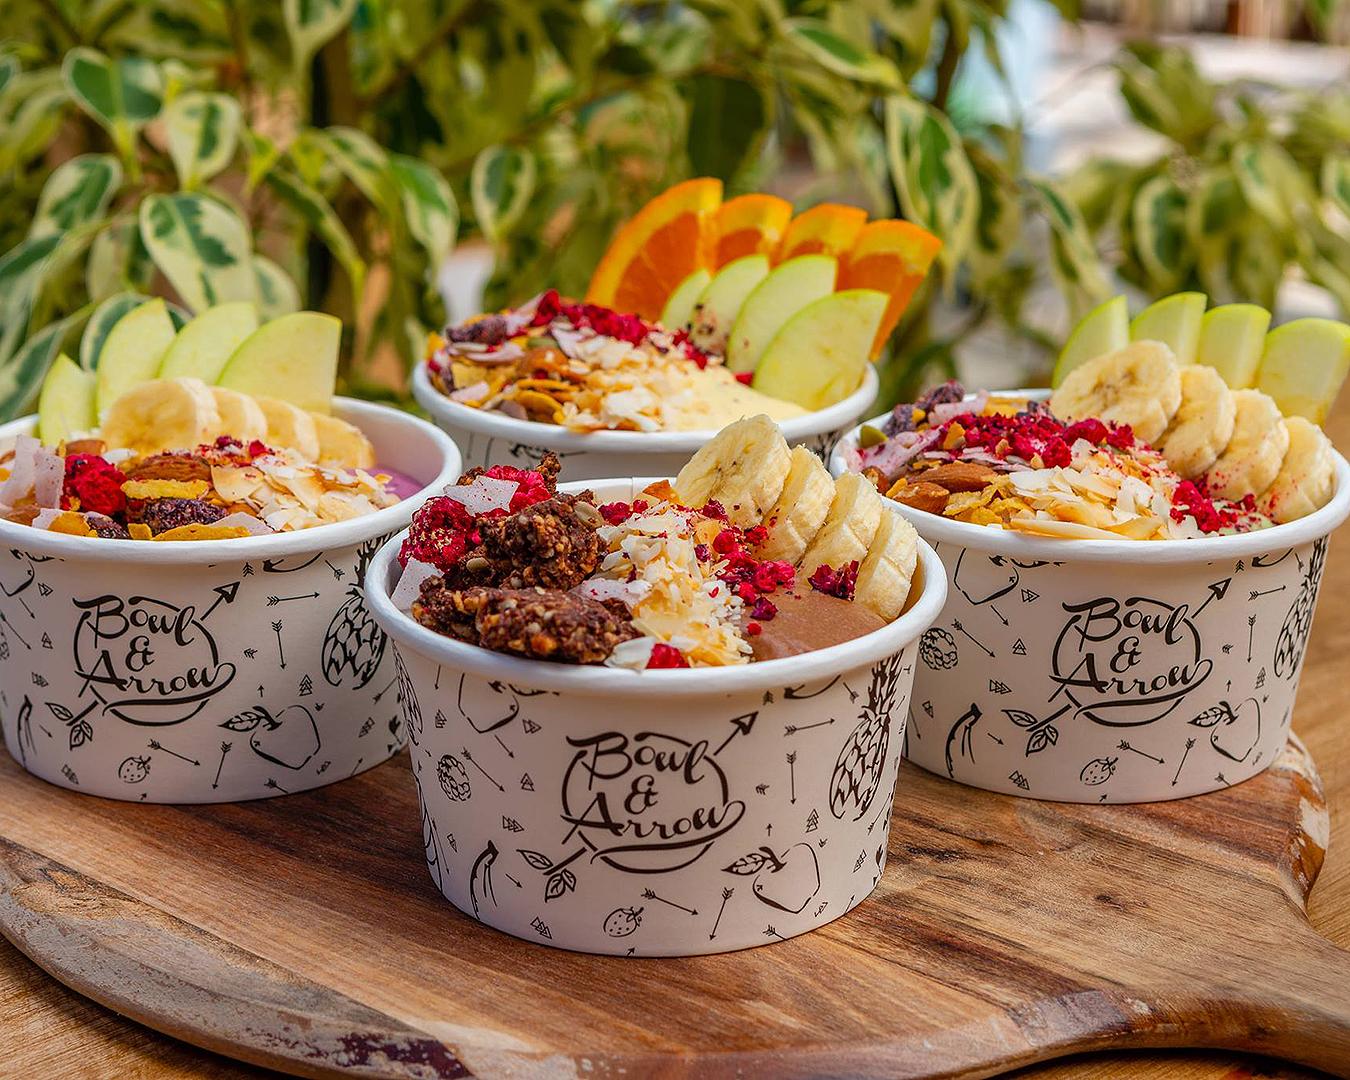 Beautiful smoothie bowls at Bowl & Arrow